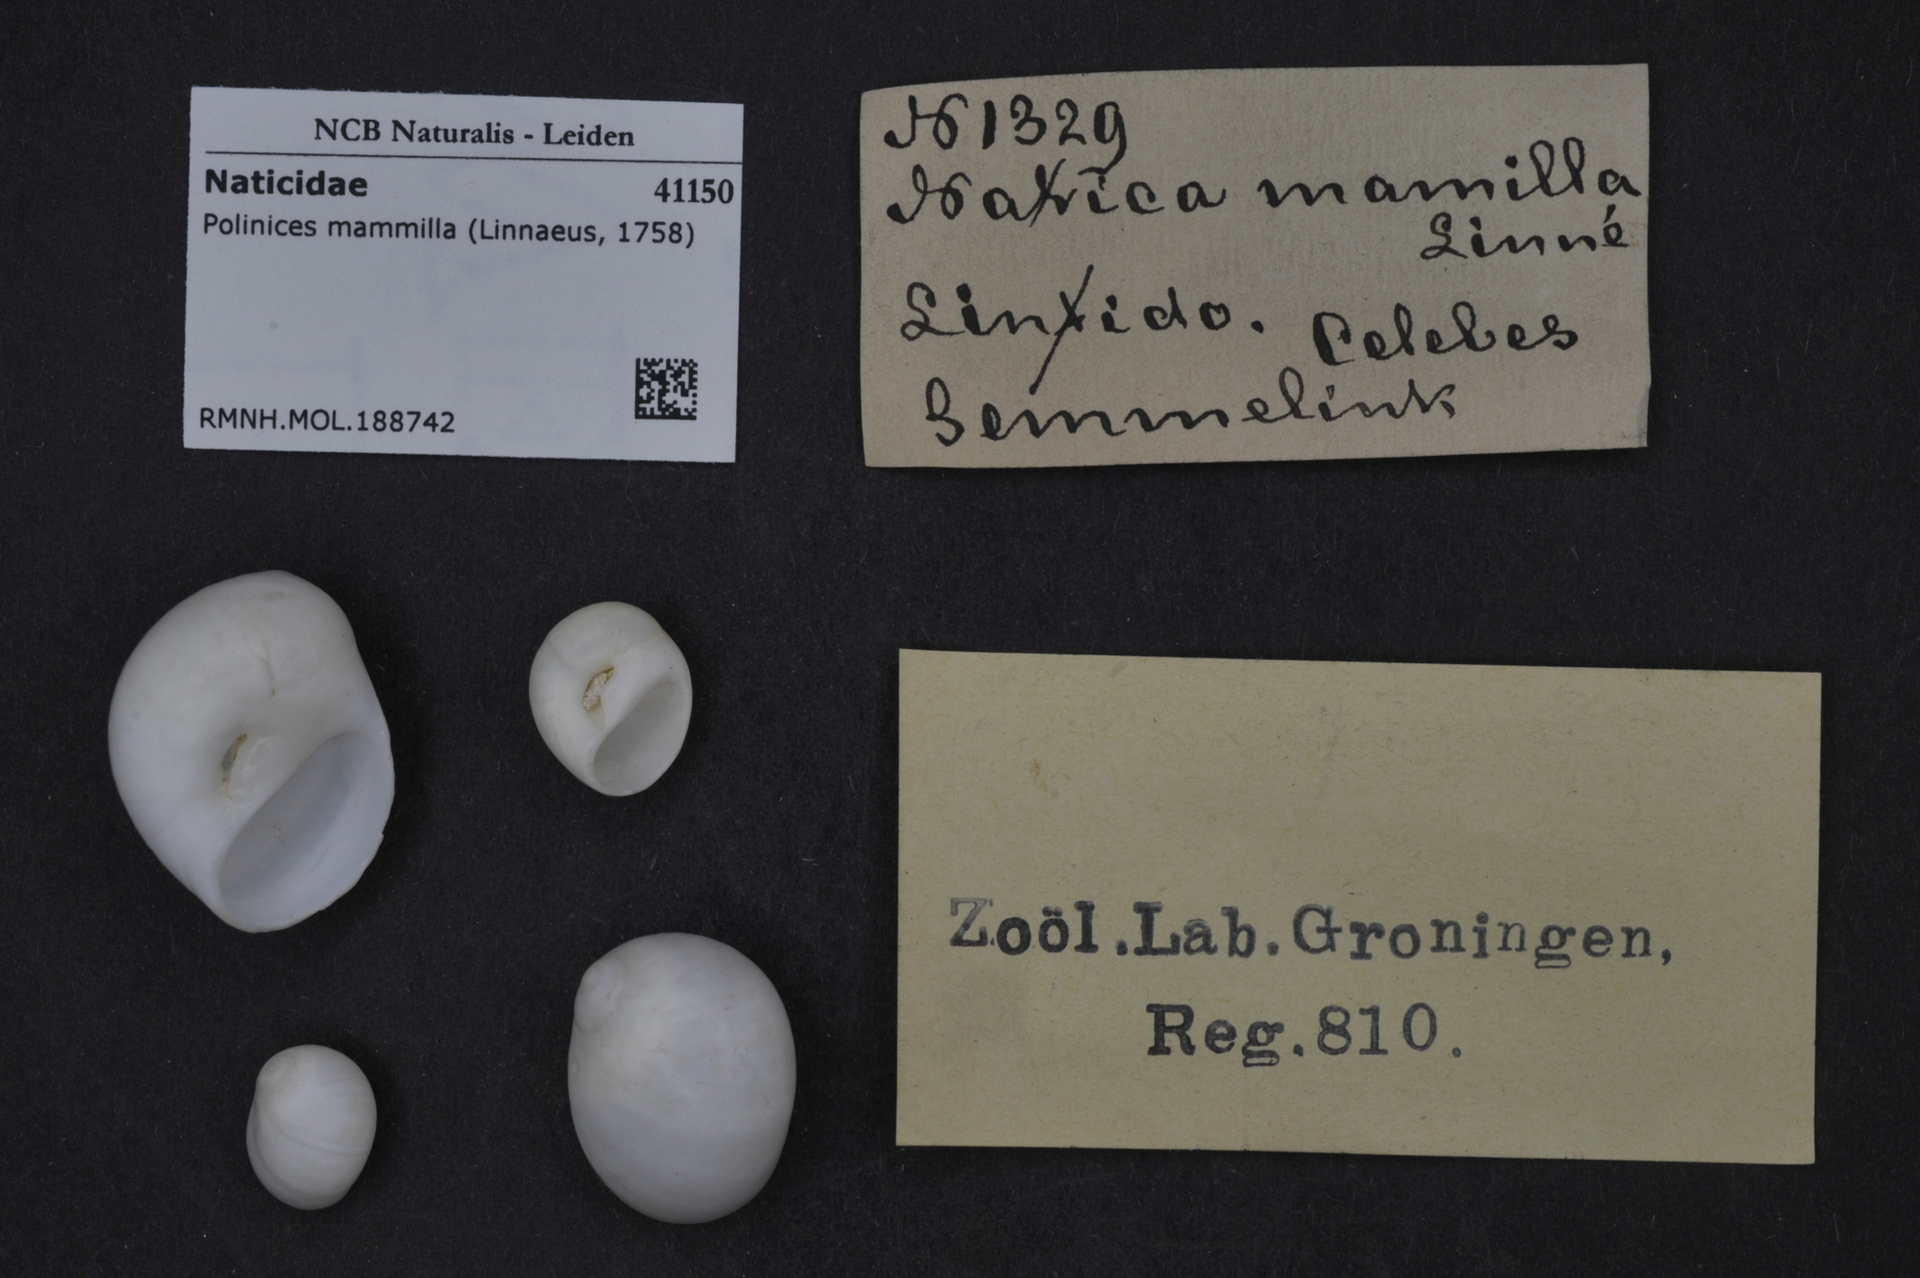 RMNH.MOL.188742 | Polinices mammilla (Linnaeus, 1758)